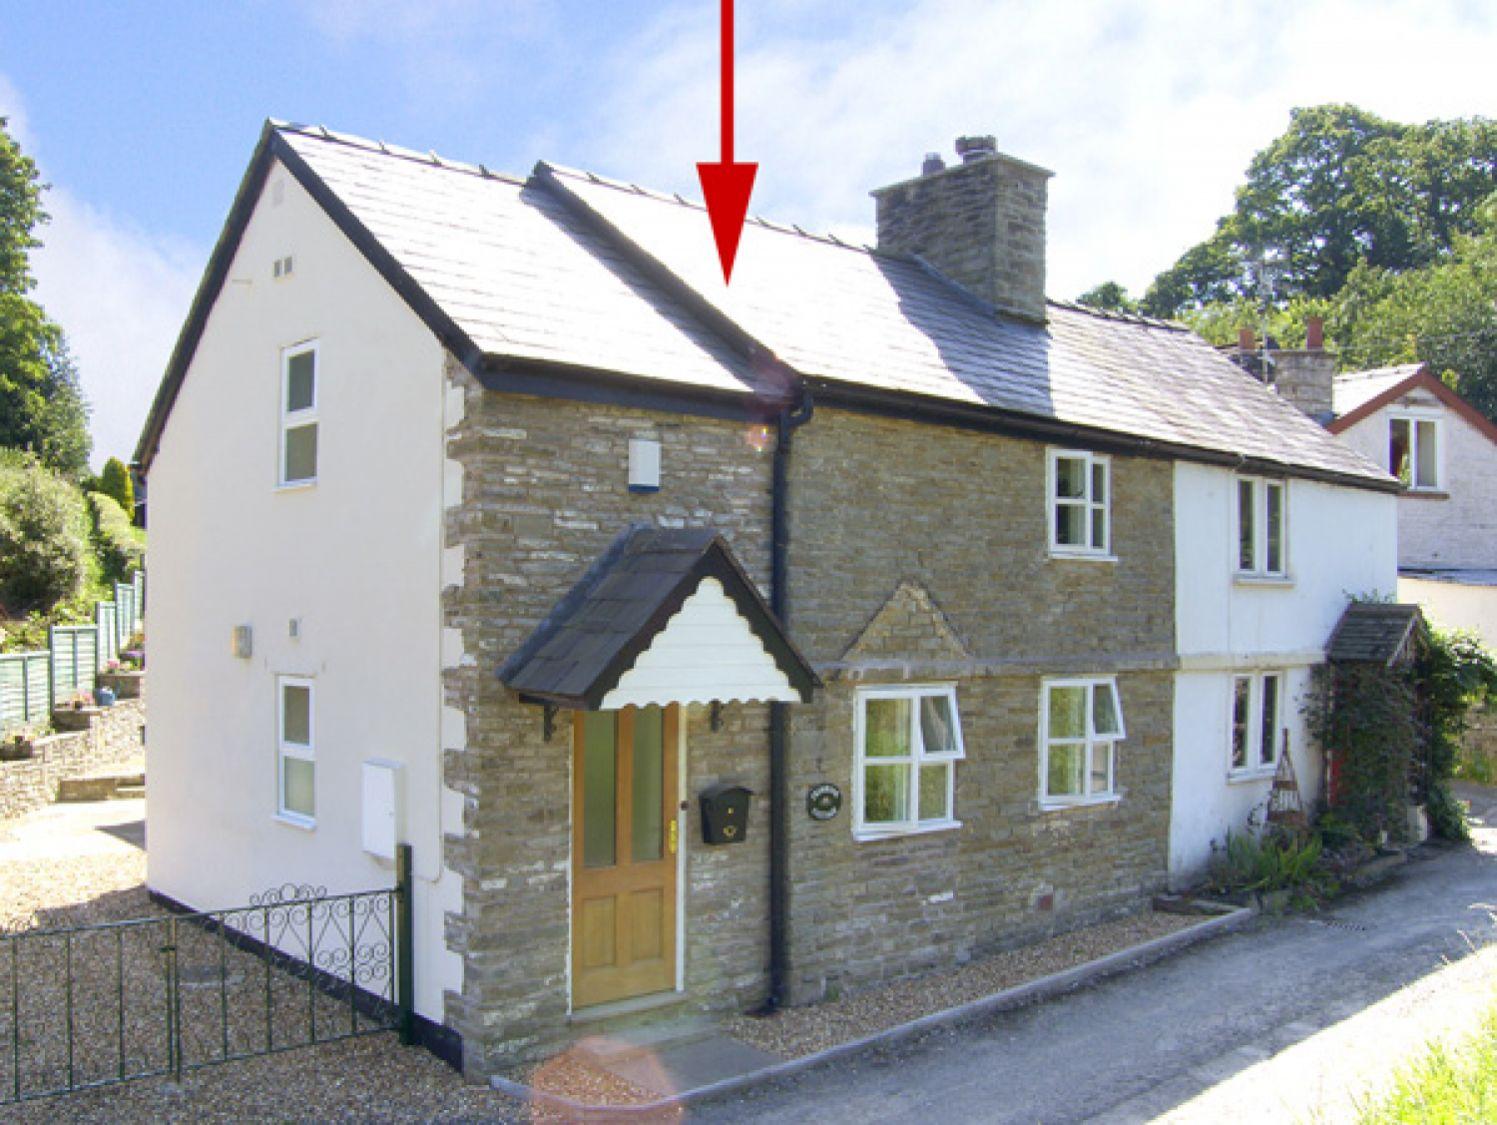 Primrose Cottage - Herefordshire - 2247 - photo 1